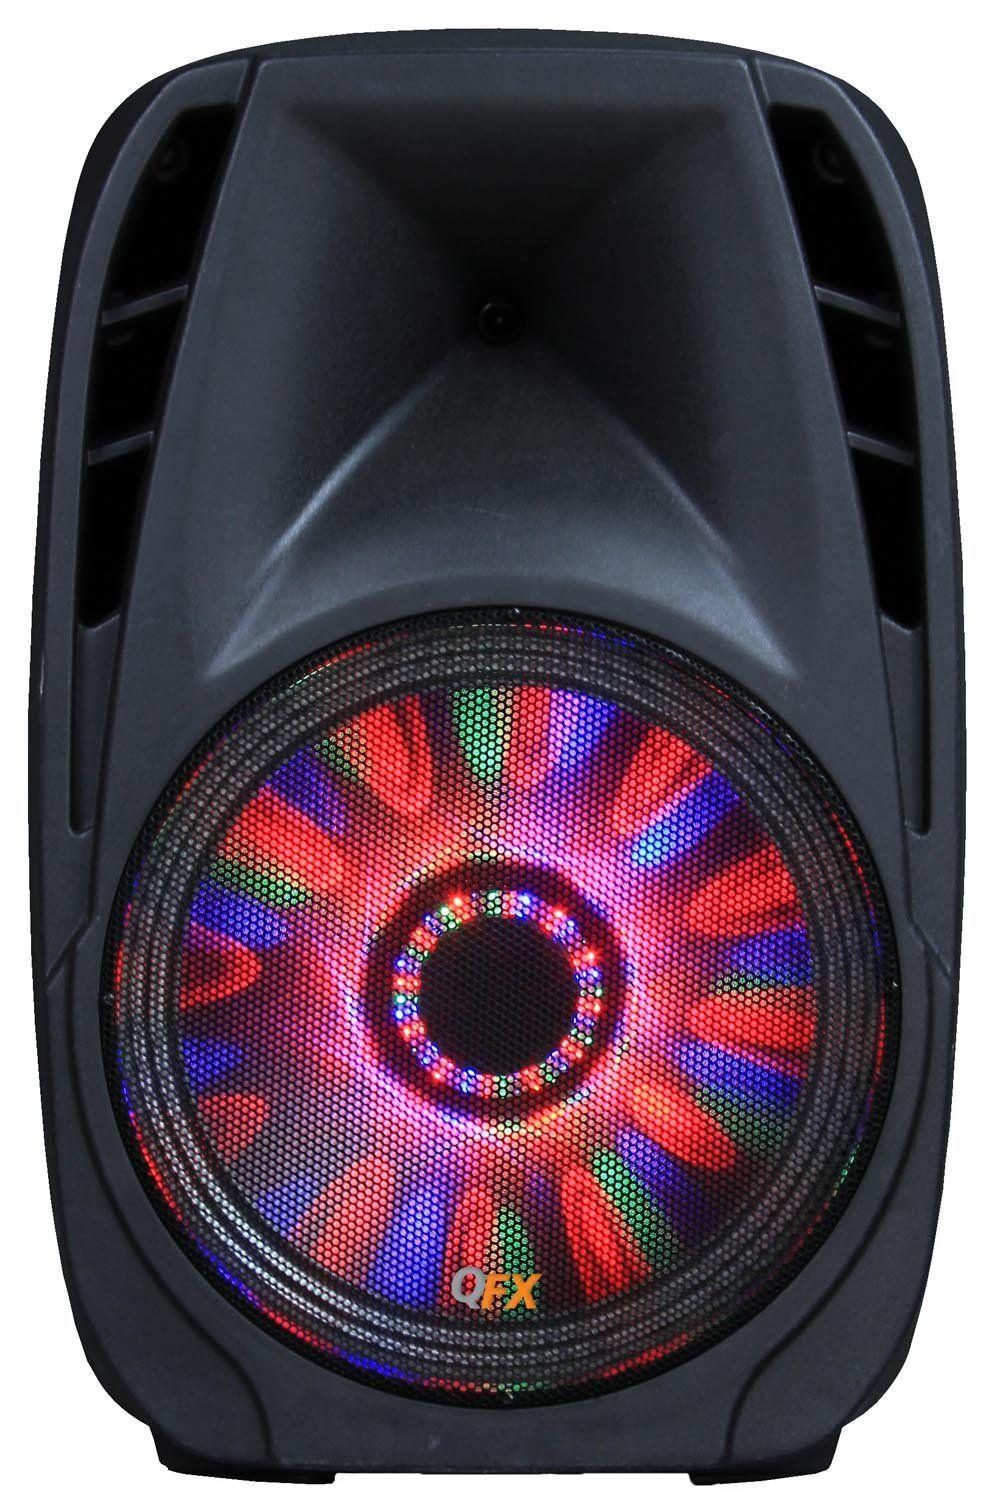 Moonlight Speakers qfx pbx-71100btl portable bluetooth party speaker. fm tuner with